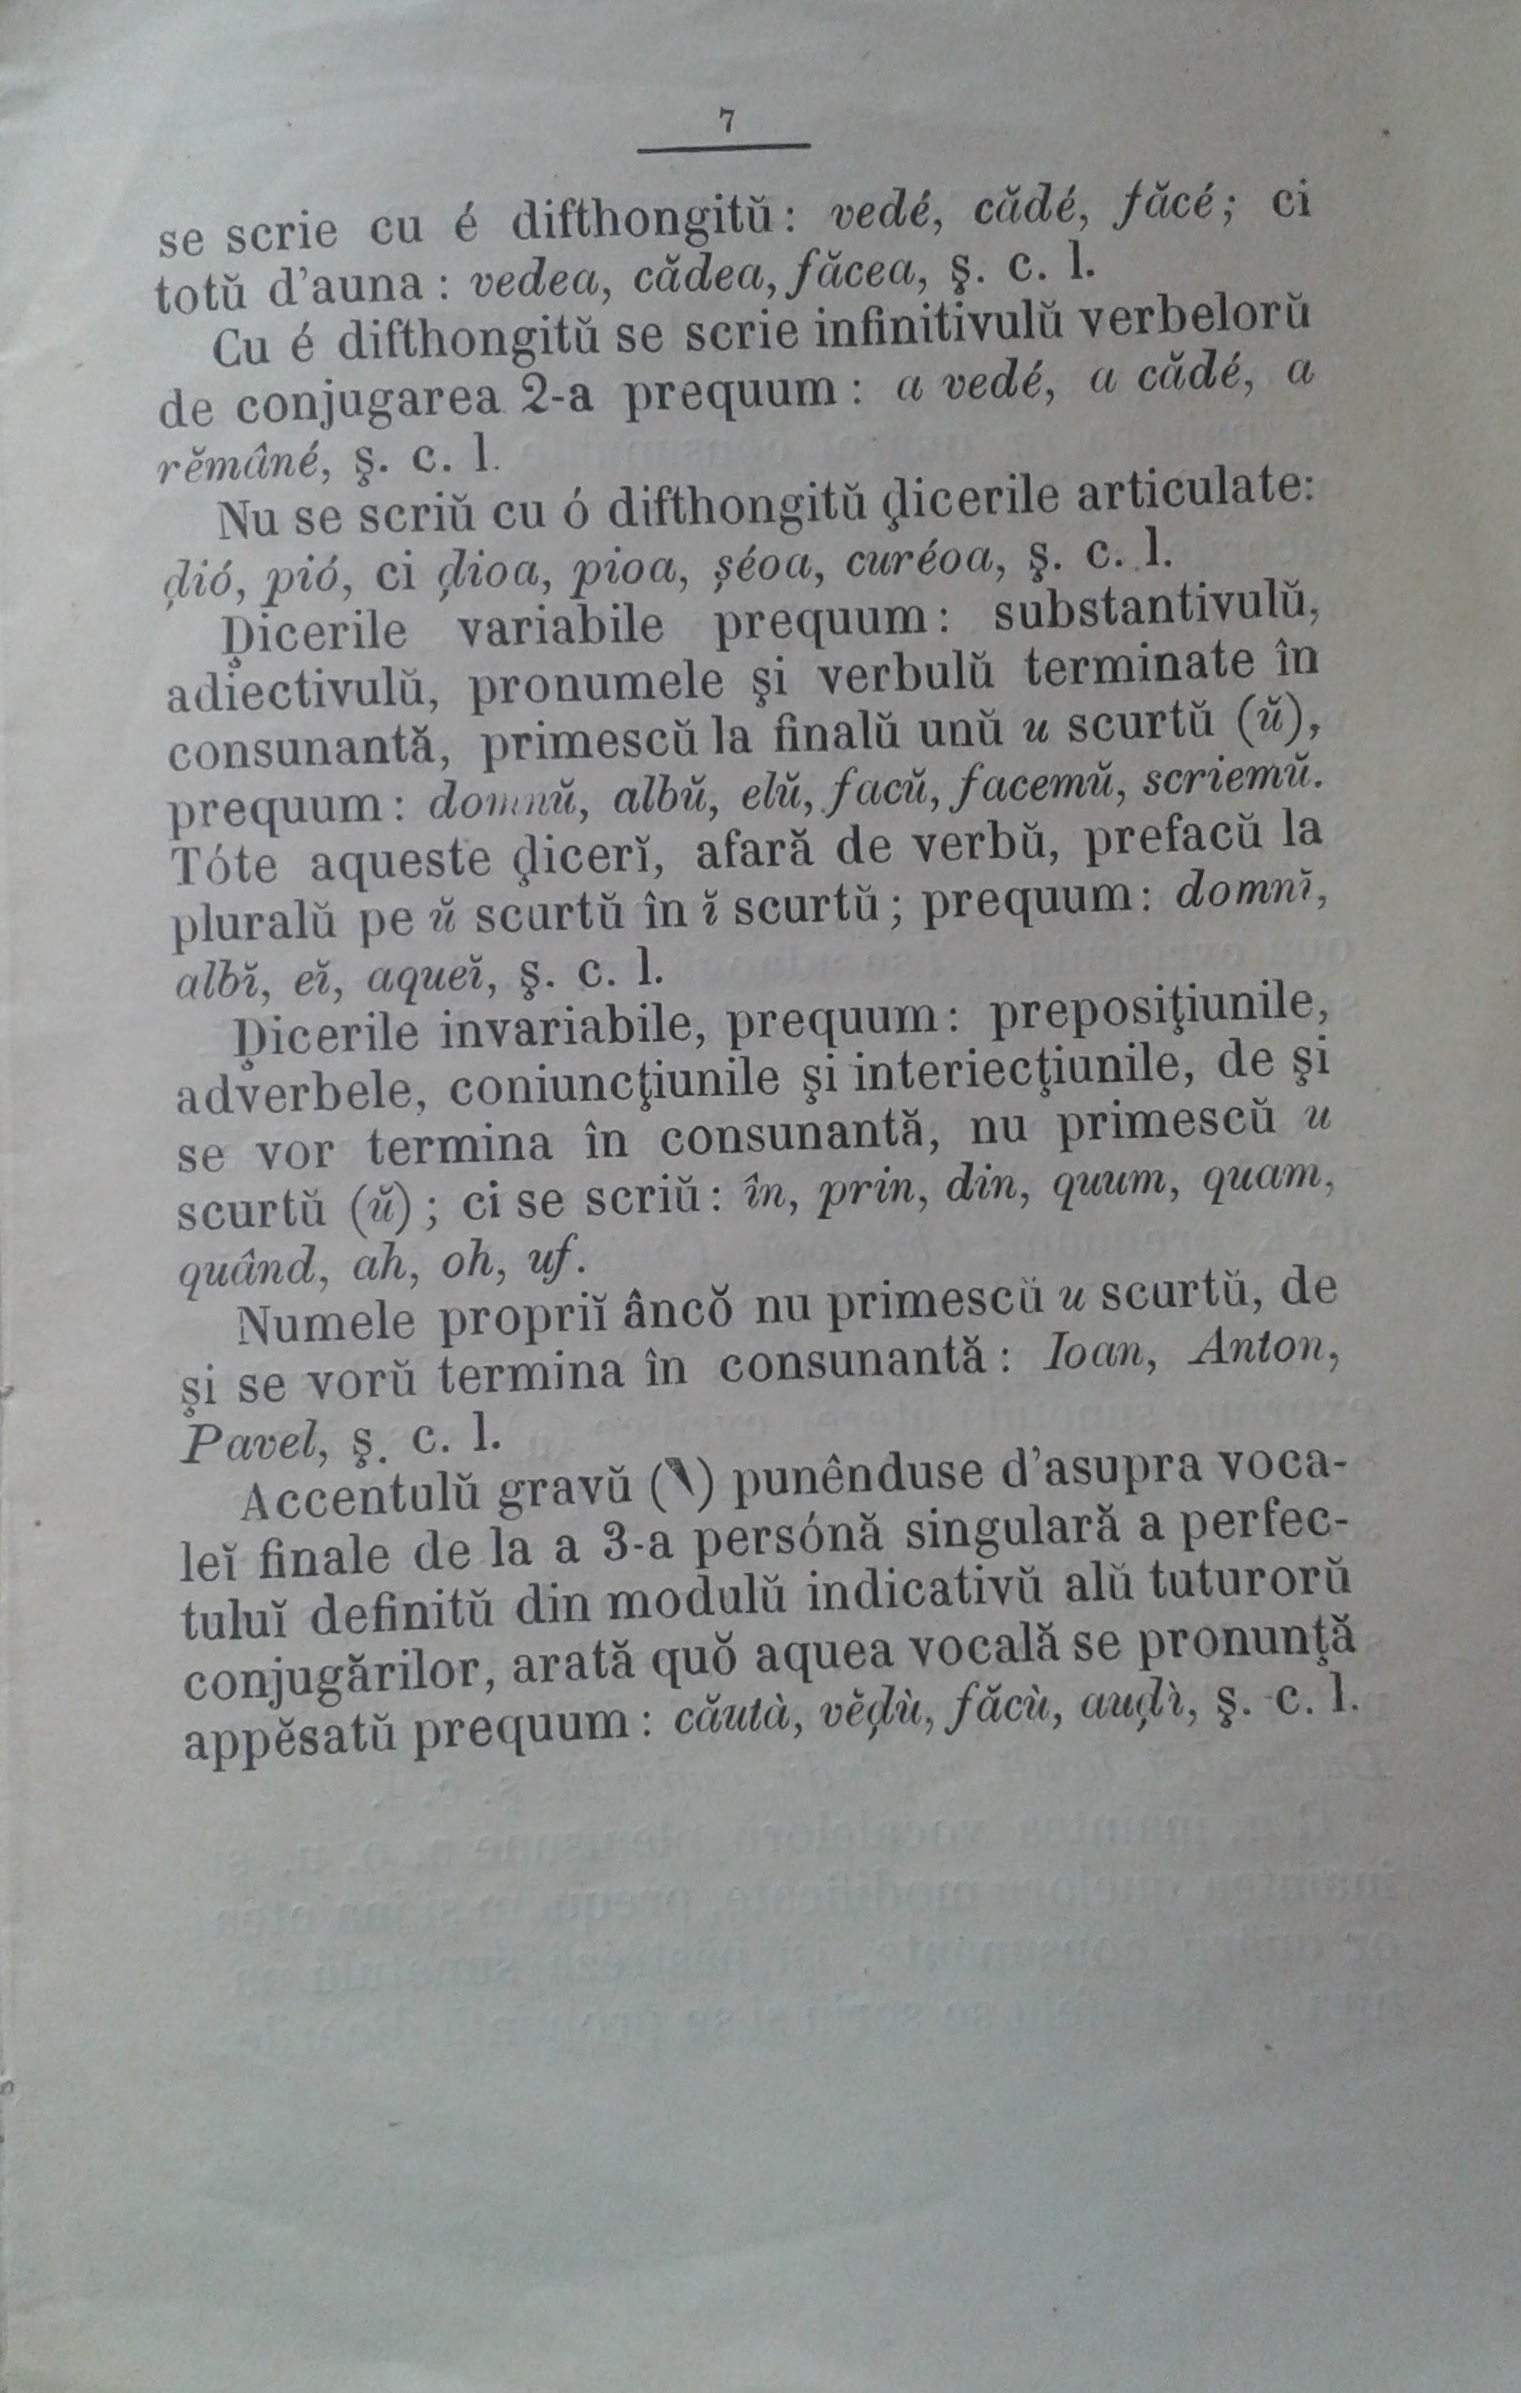 Regule ortografice 1871 (6).jpg